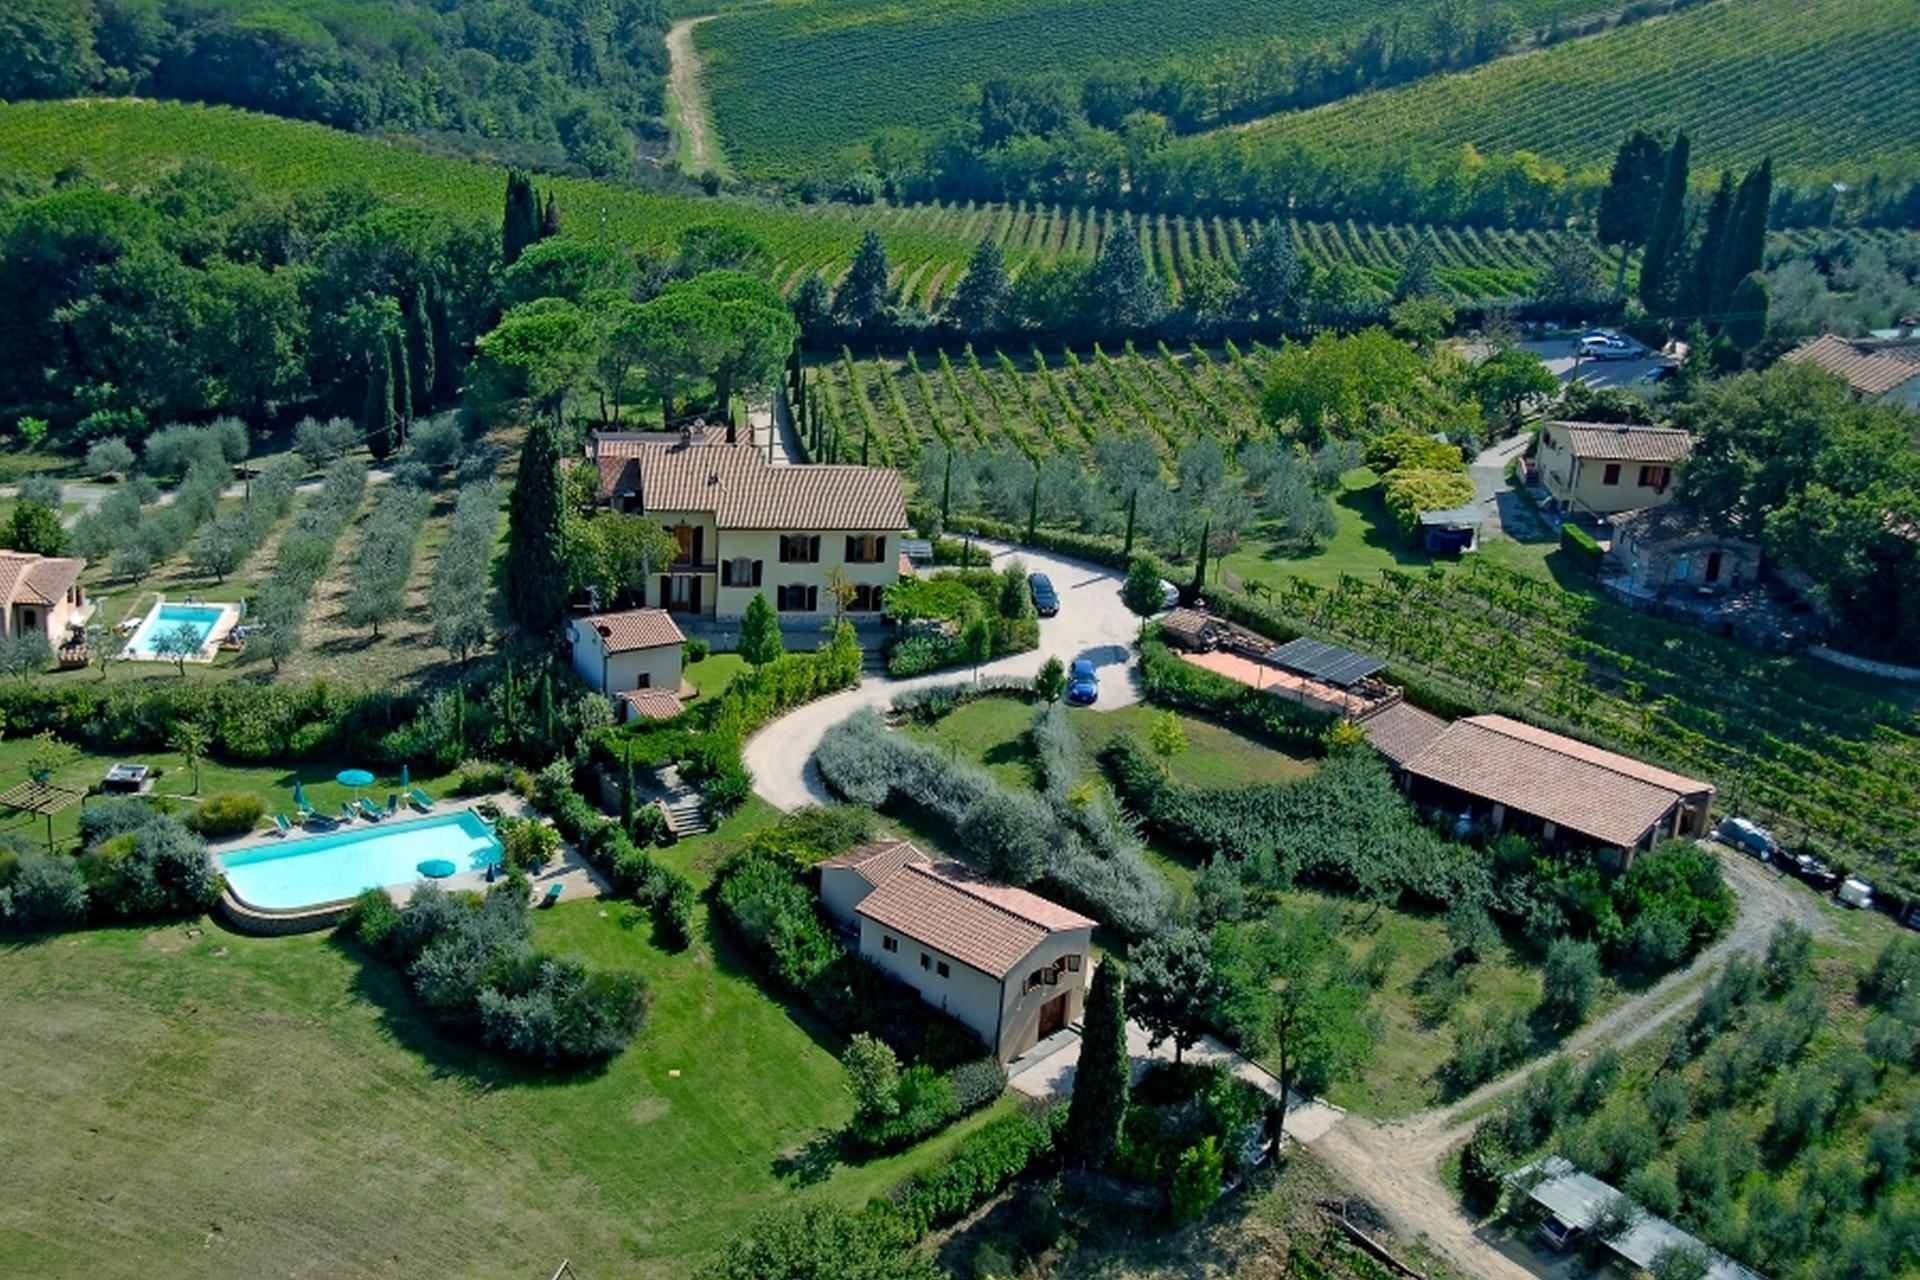 Agriturismo Toskana Agriturismo Toskana, mit einzigartigem Blick auf San Gimignano